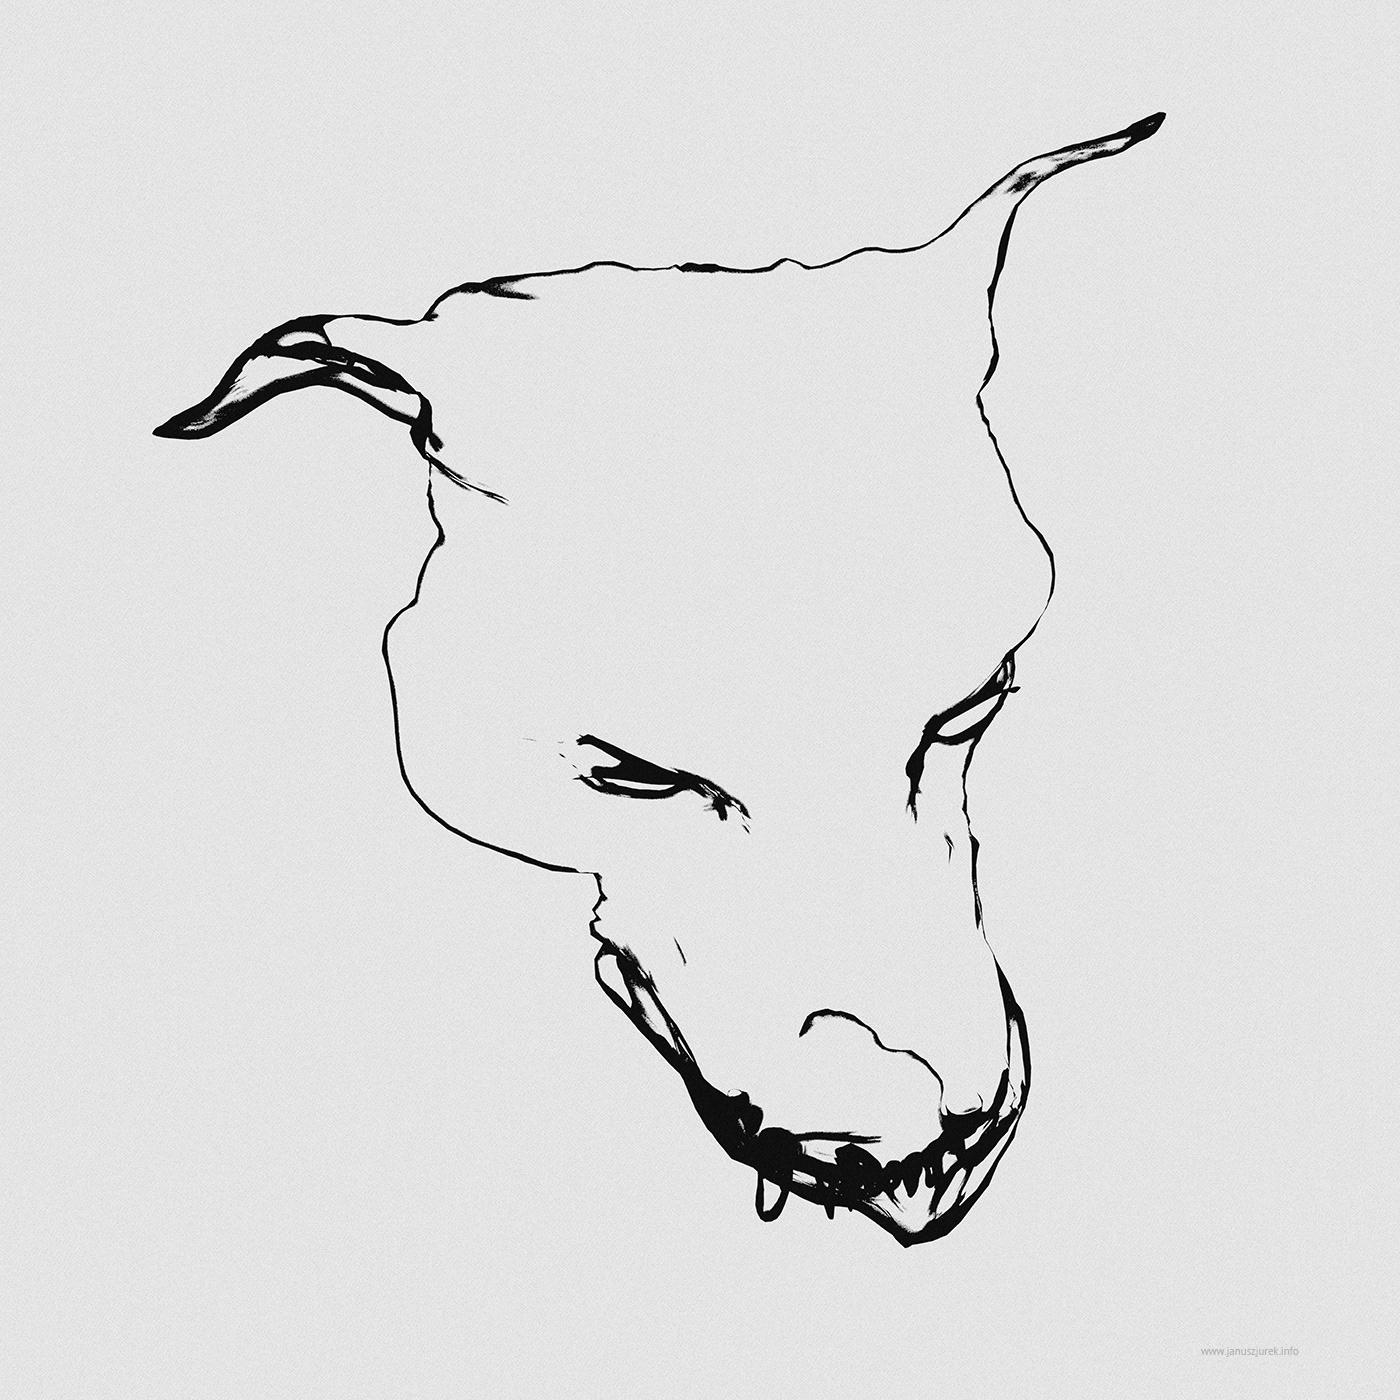 animal animals dods dog generative janusz januszjurek jurek  line poster